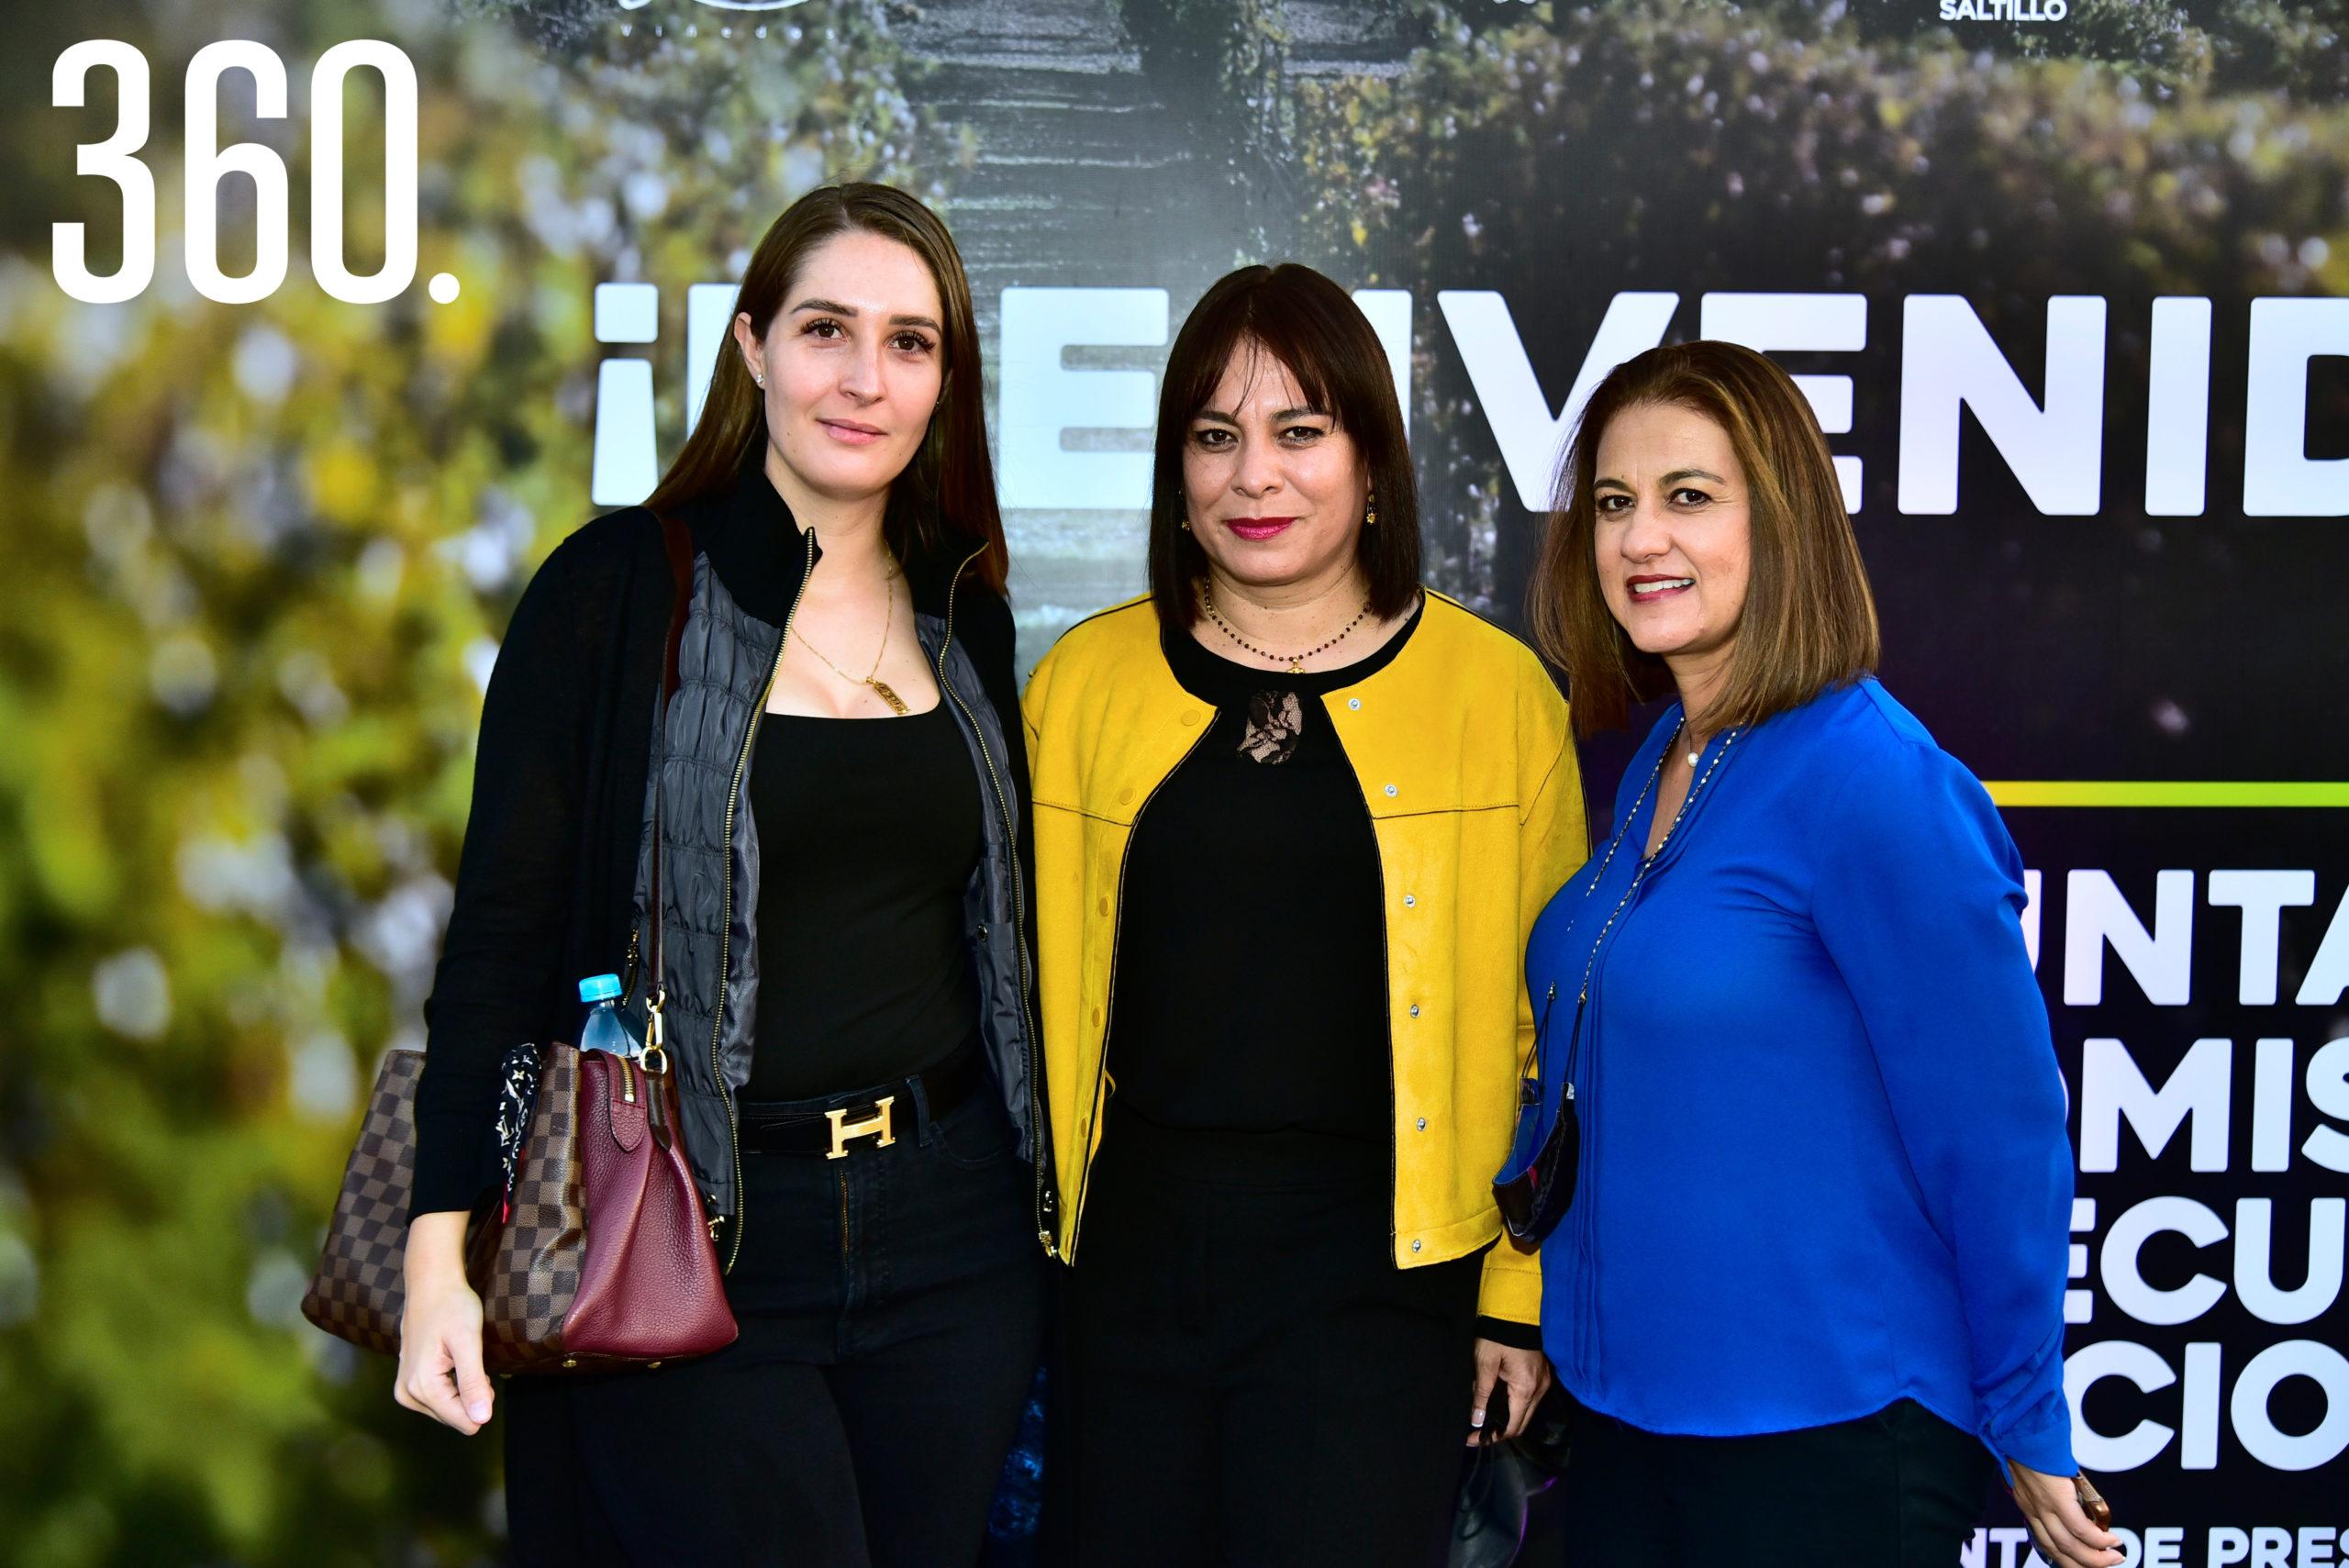 Ana Emilia Pérez, Claudia Rueda y Martha Álvarez.